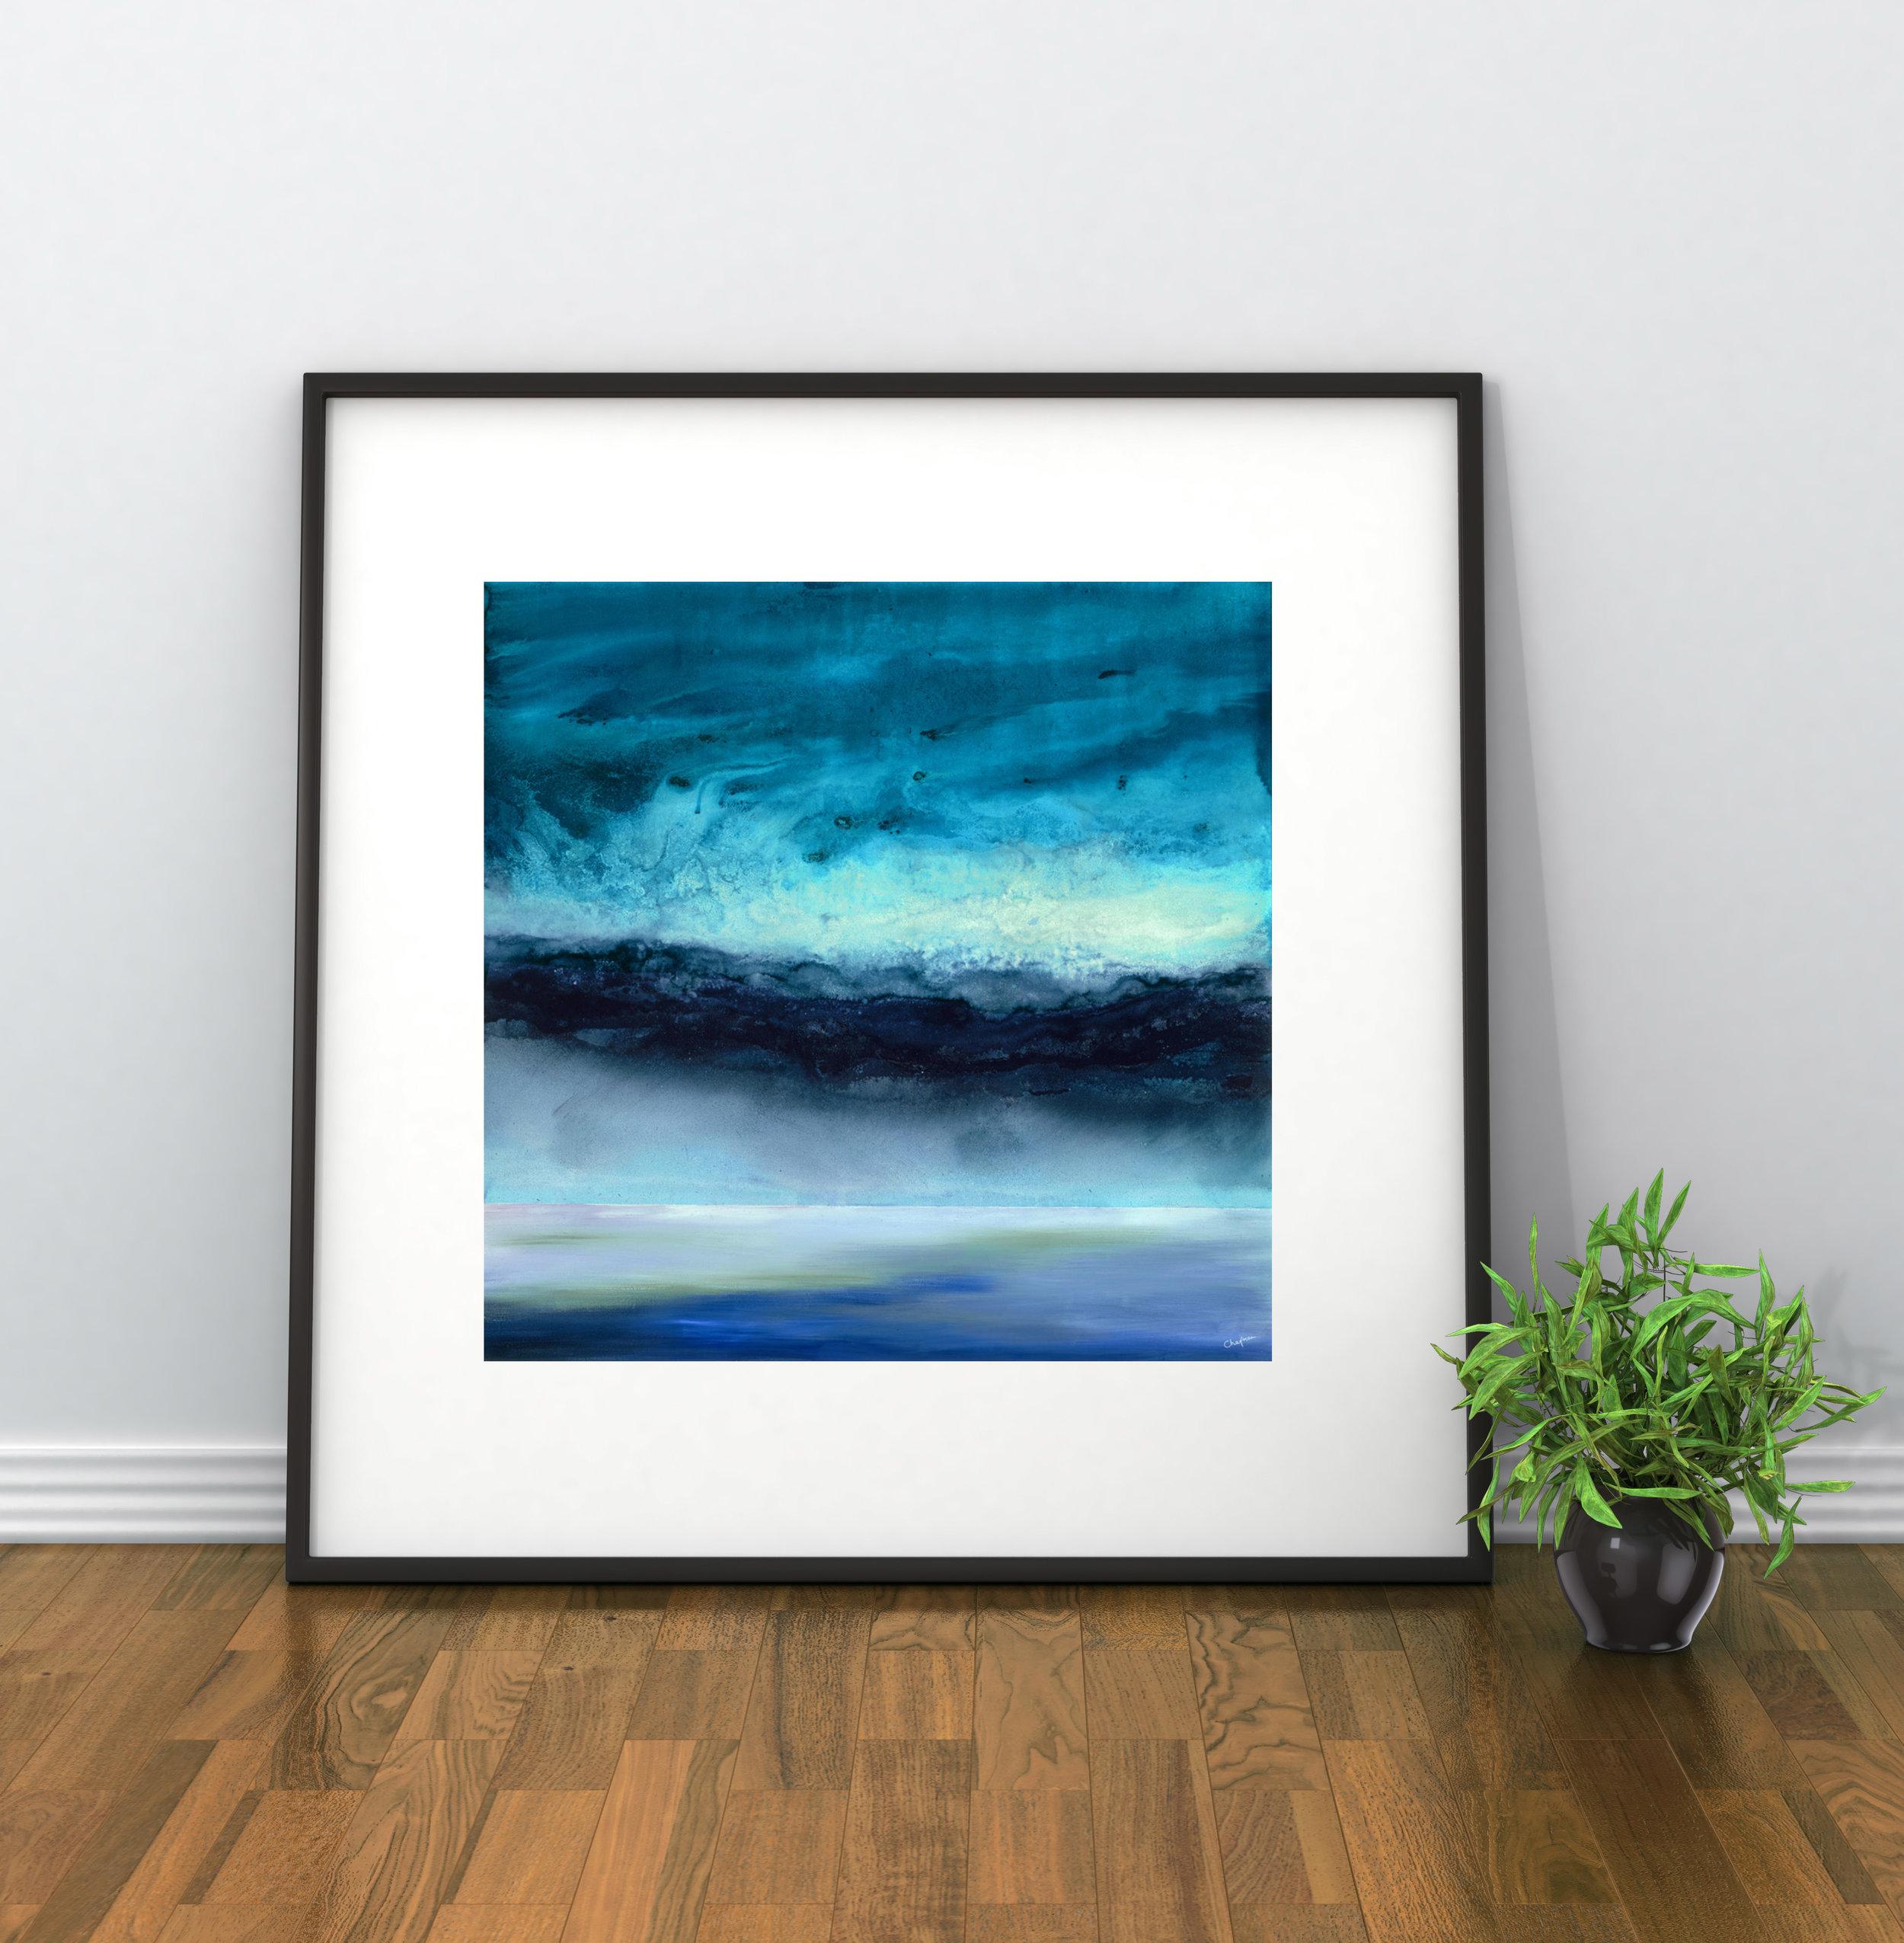 'Resonate' seascape giclée print by Robbie Chapman